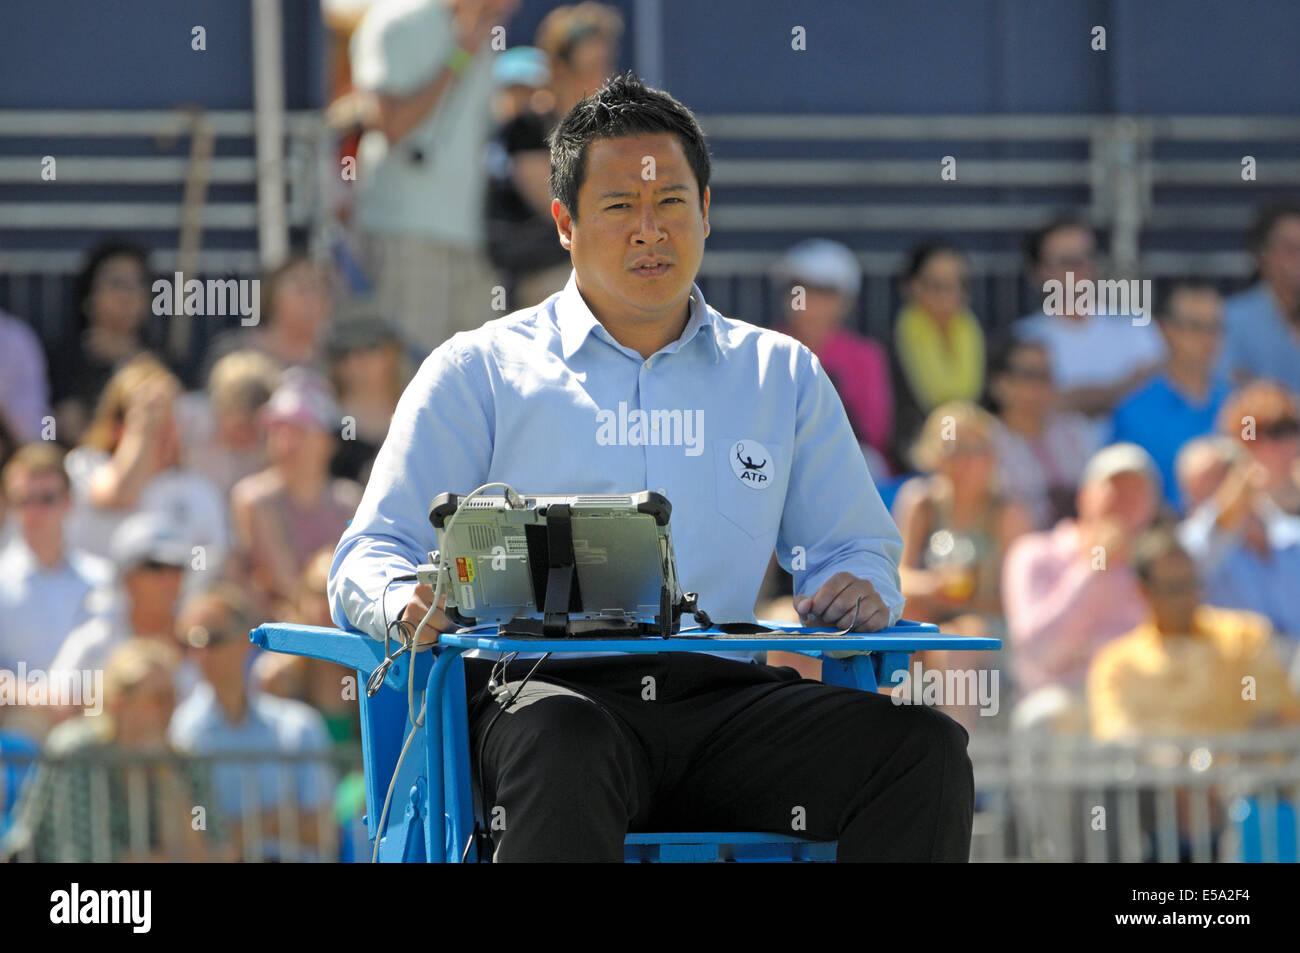 tennis umpire chair hire ergonomic edmonton aegon championship queens club london 2014